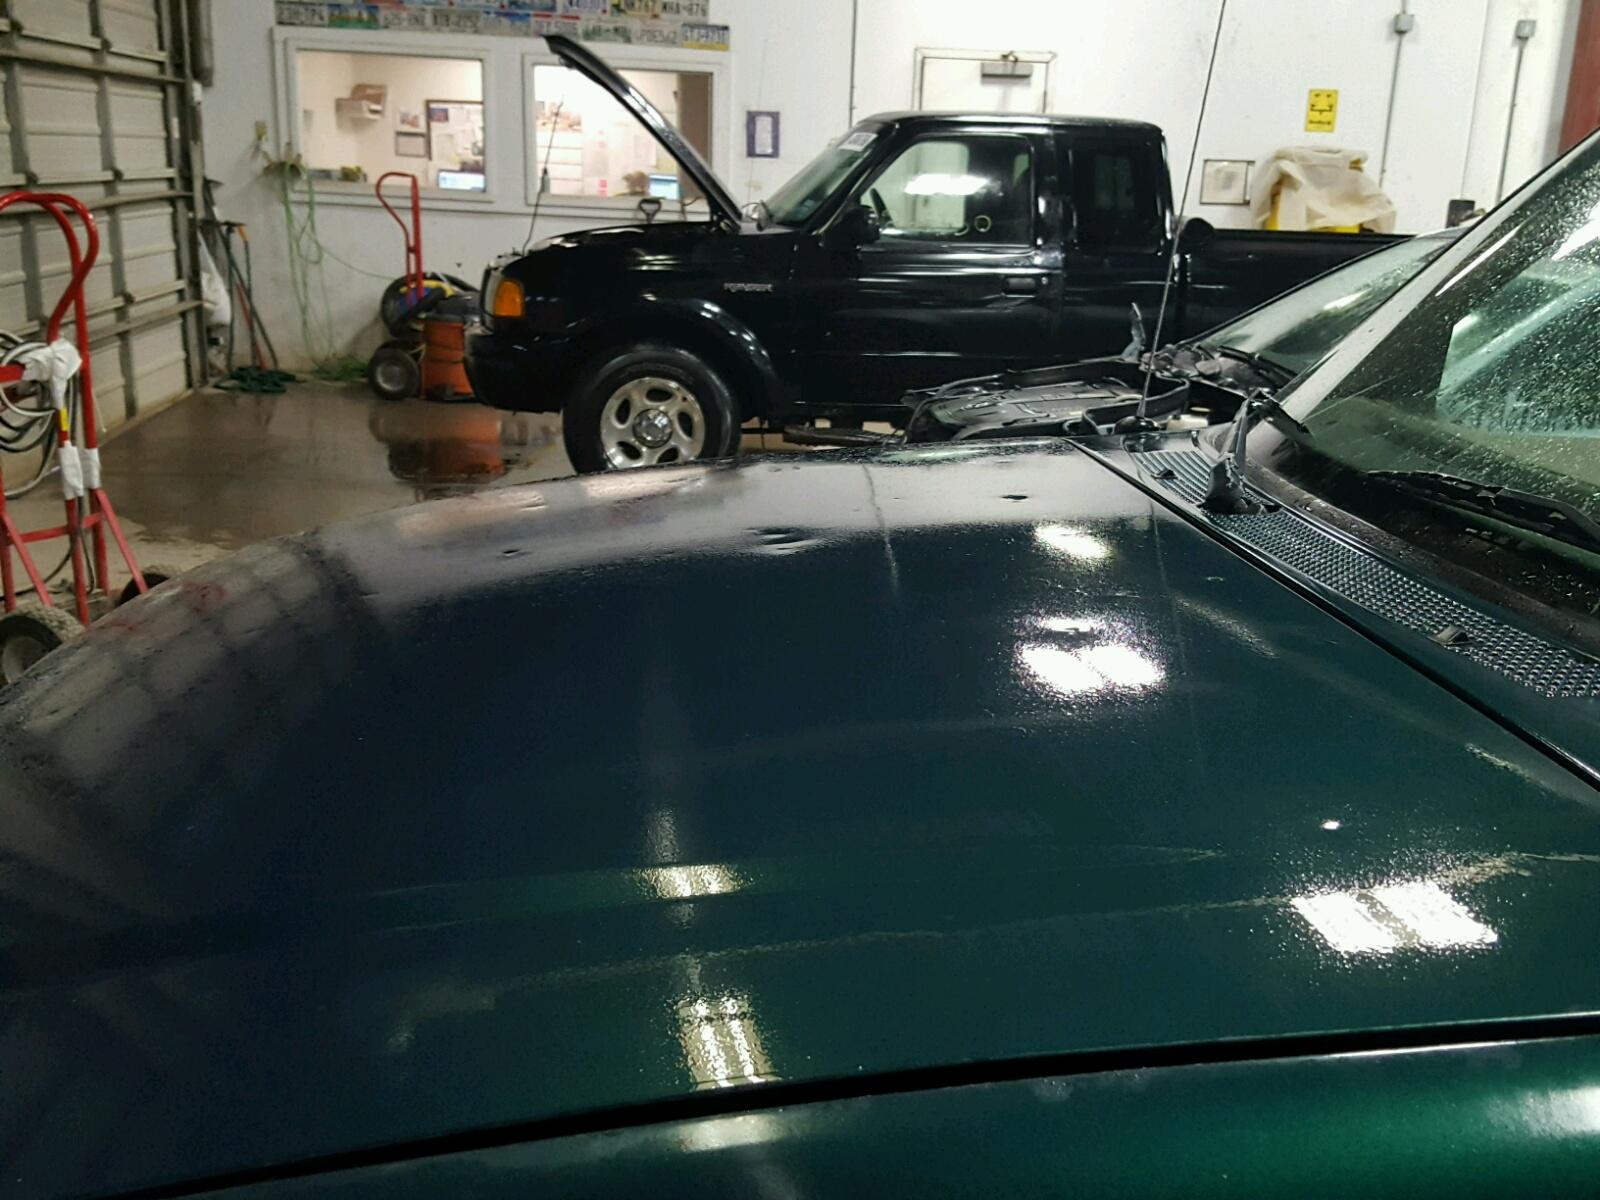 4f4yr12c9wtm01650 1998 Green Mazda B2500 On Sale In Mn Engine 25l View